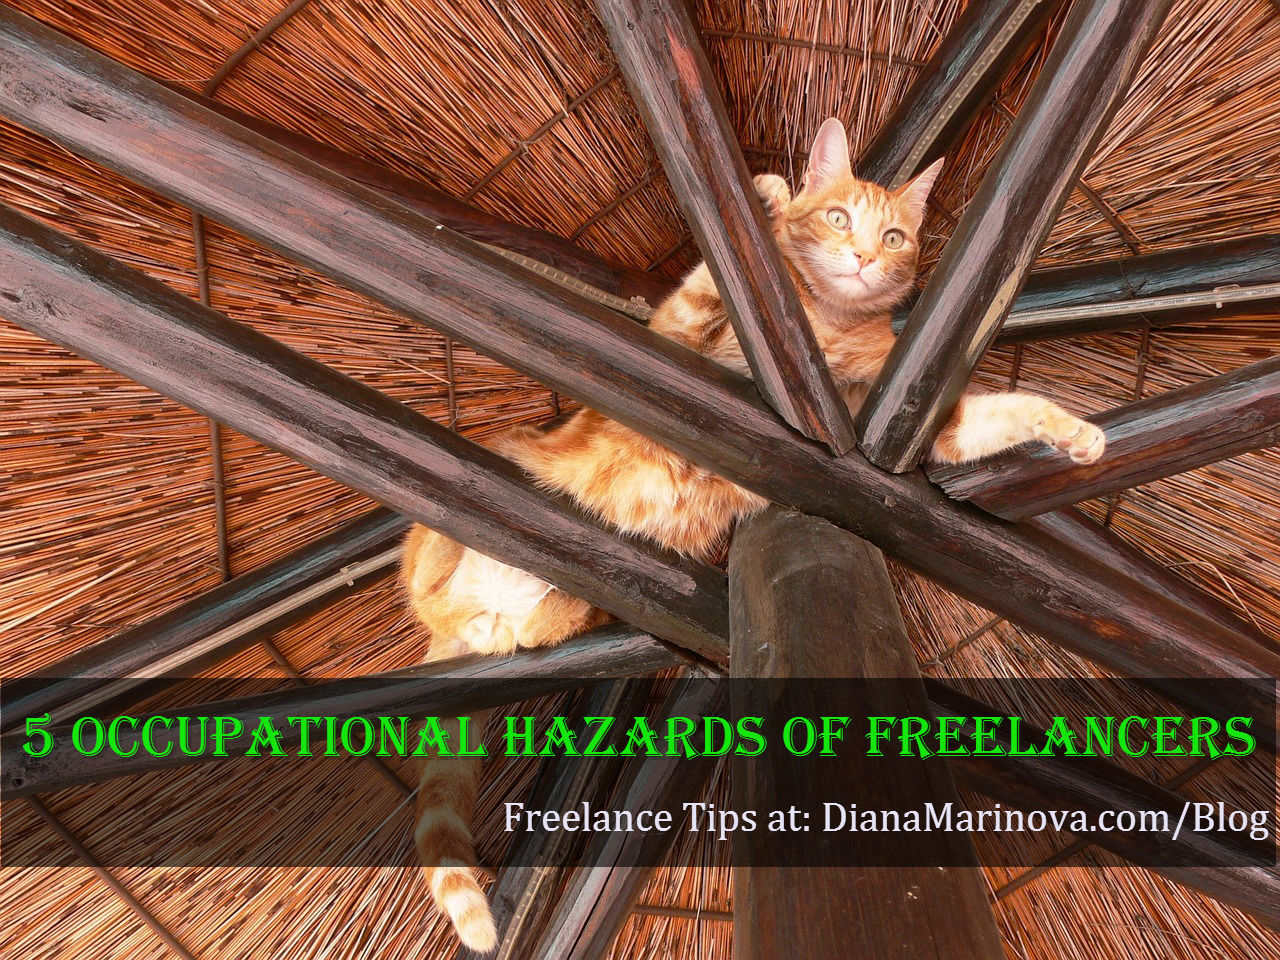 5 Occupational Hazards of Freelancers